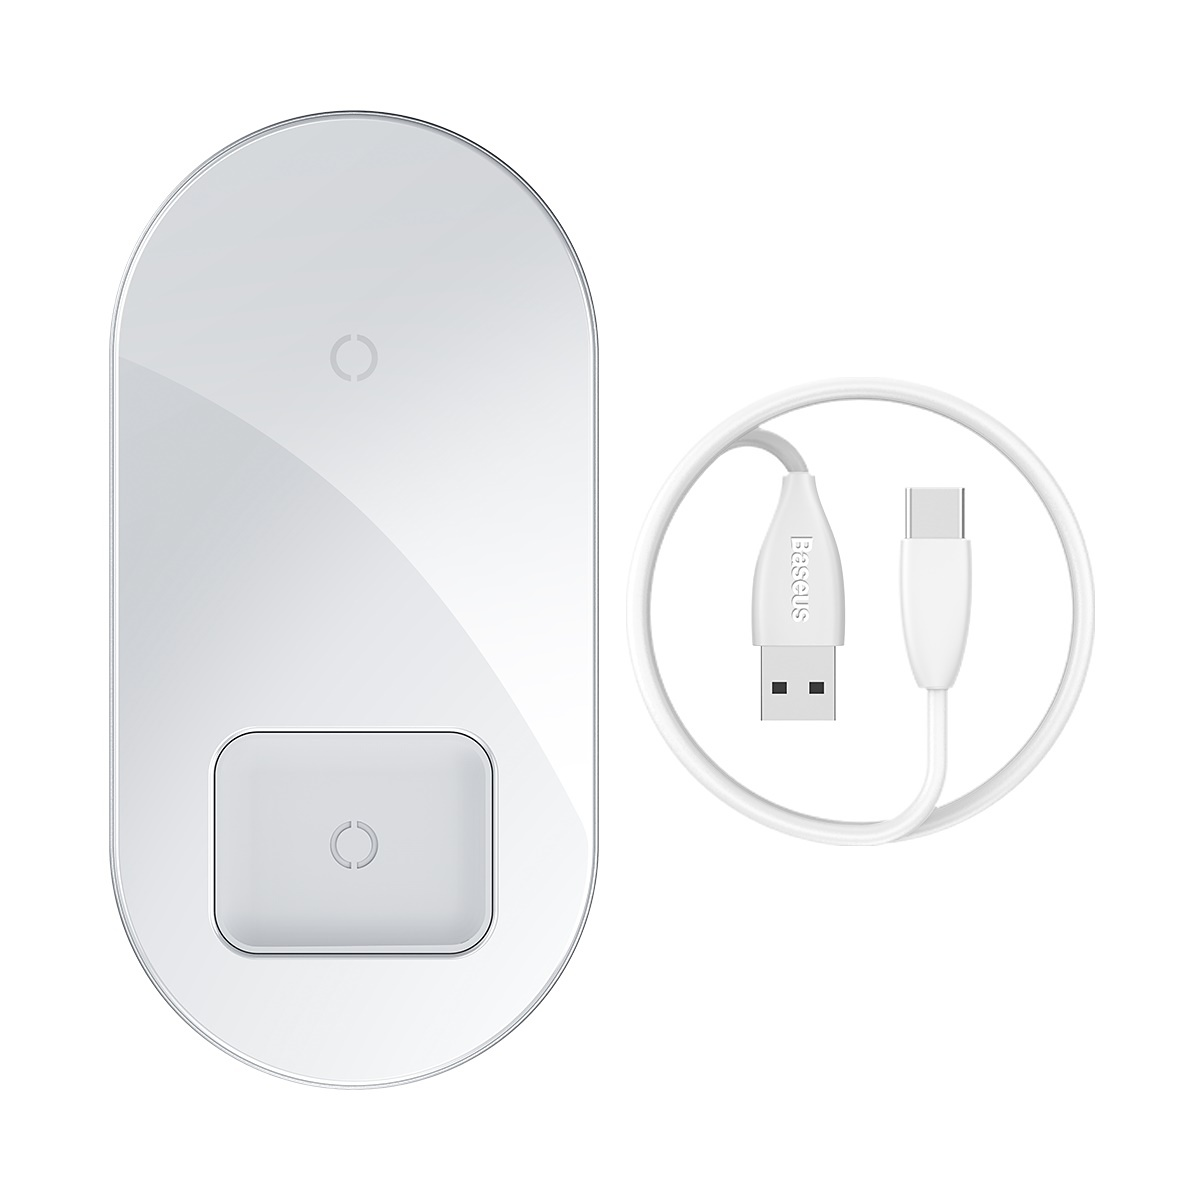 Baseus trådlös dualladdare, snabbladdning, 15W, vit